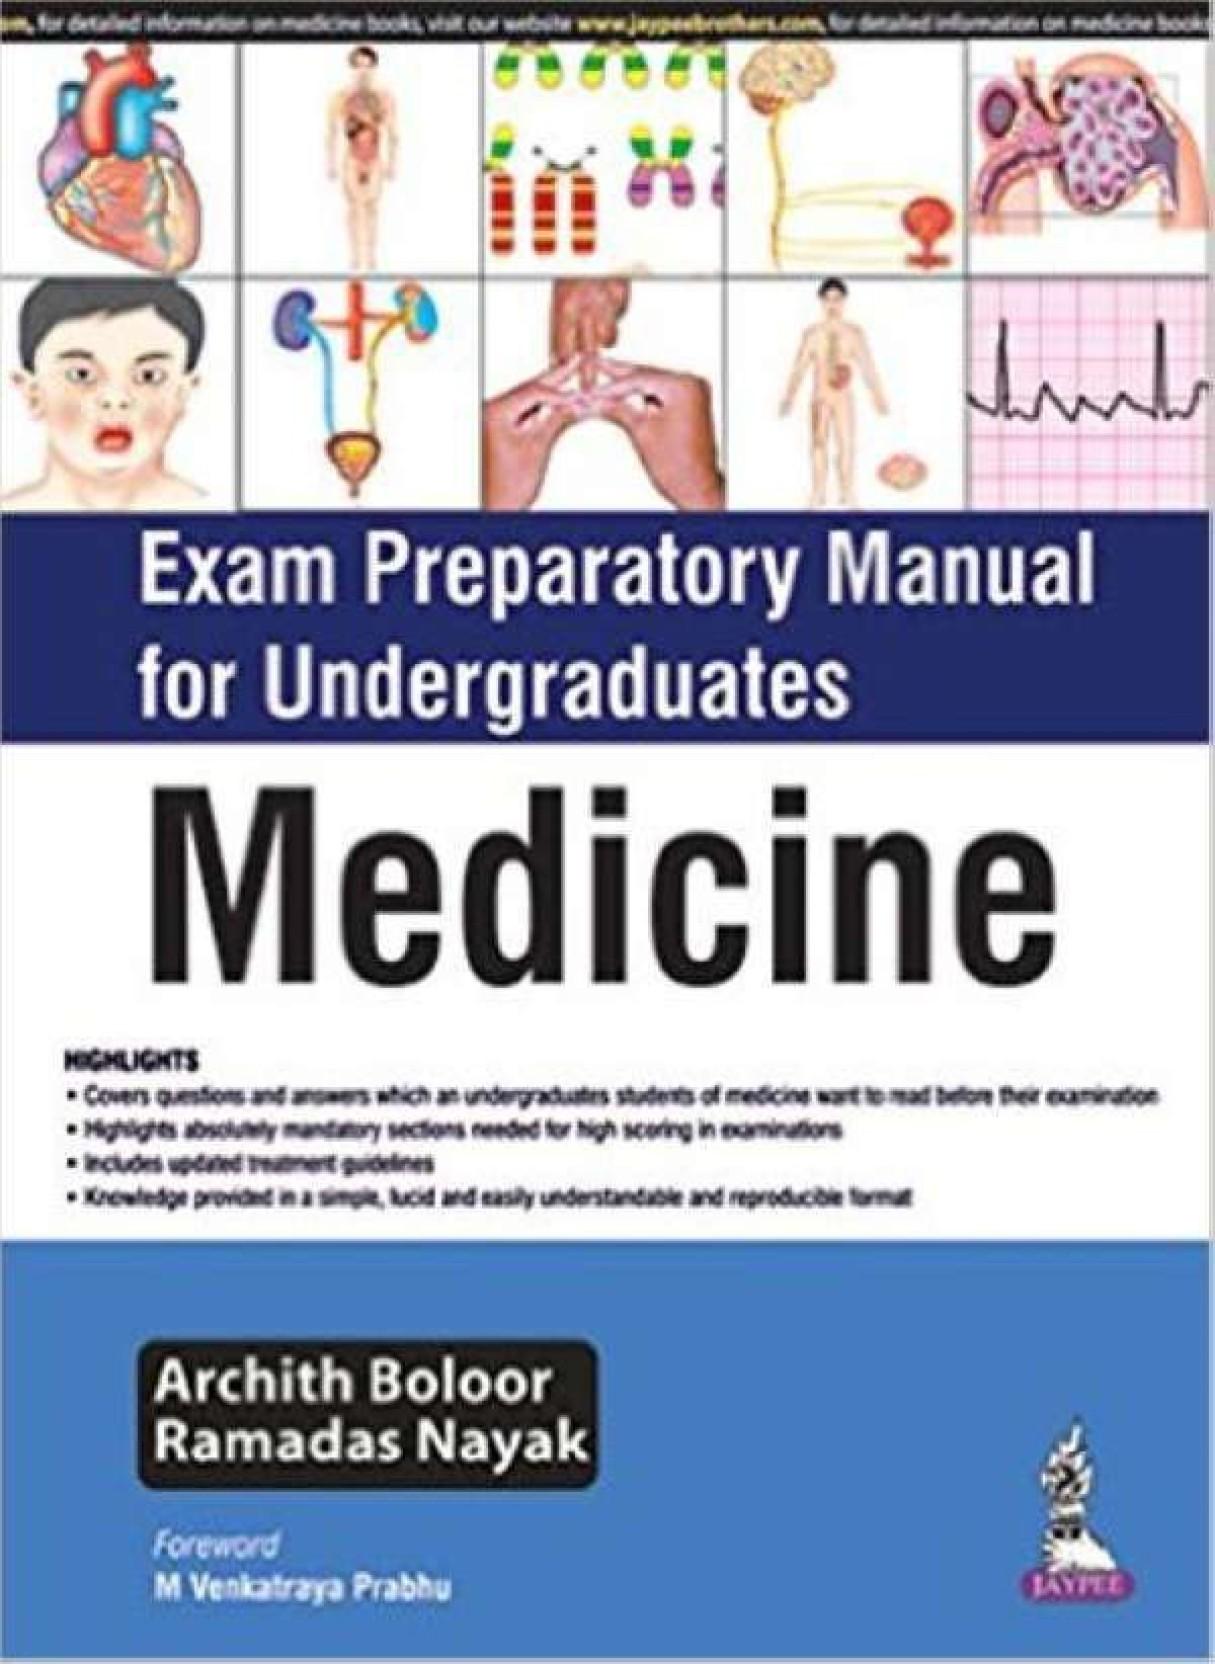 Exam Preparatory Manual Medicine. ADD TO CART